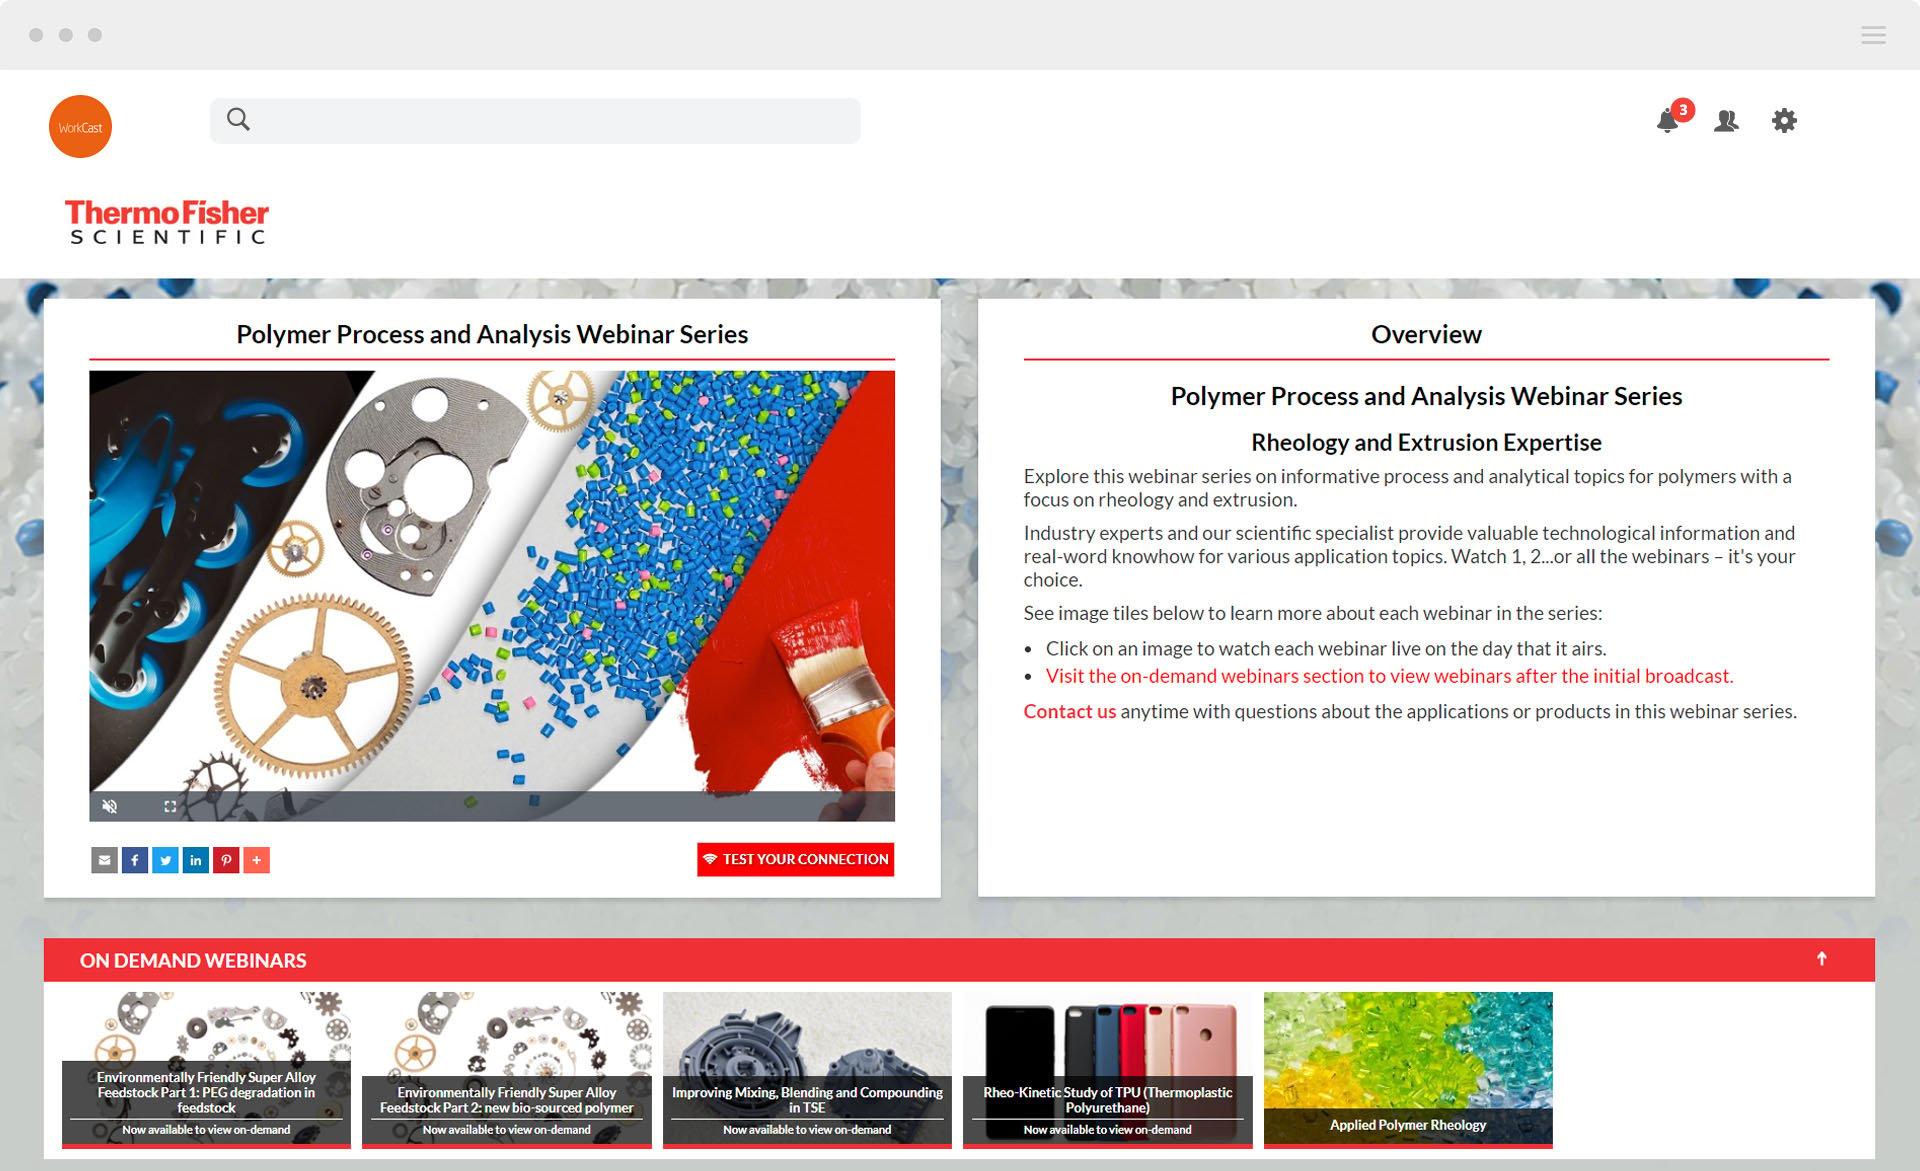 thermo-fisher-scientific-branded-webinar